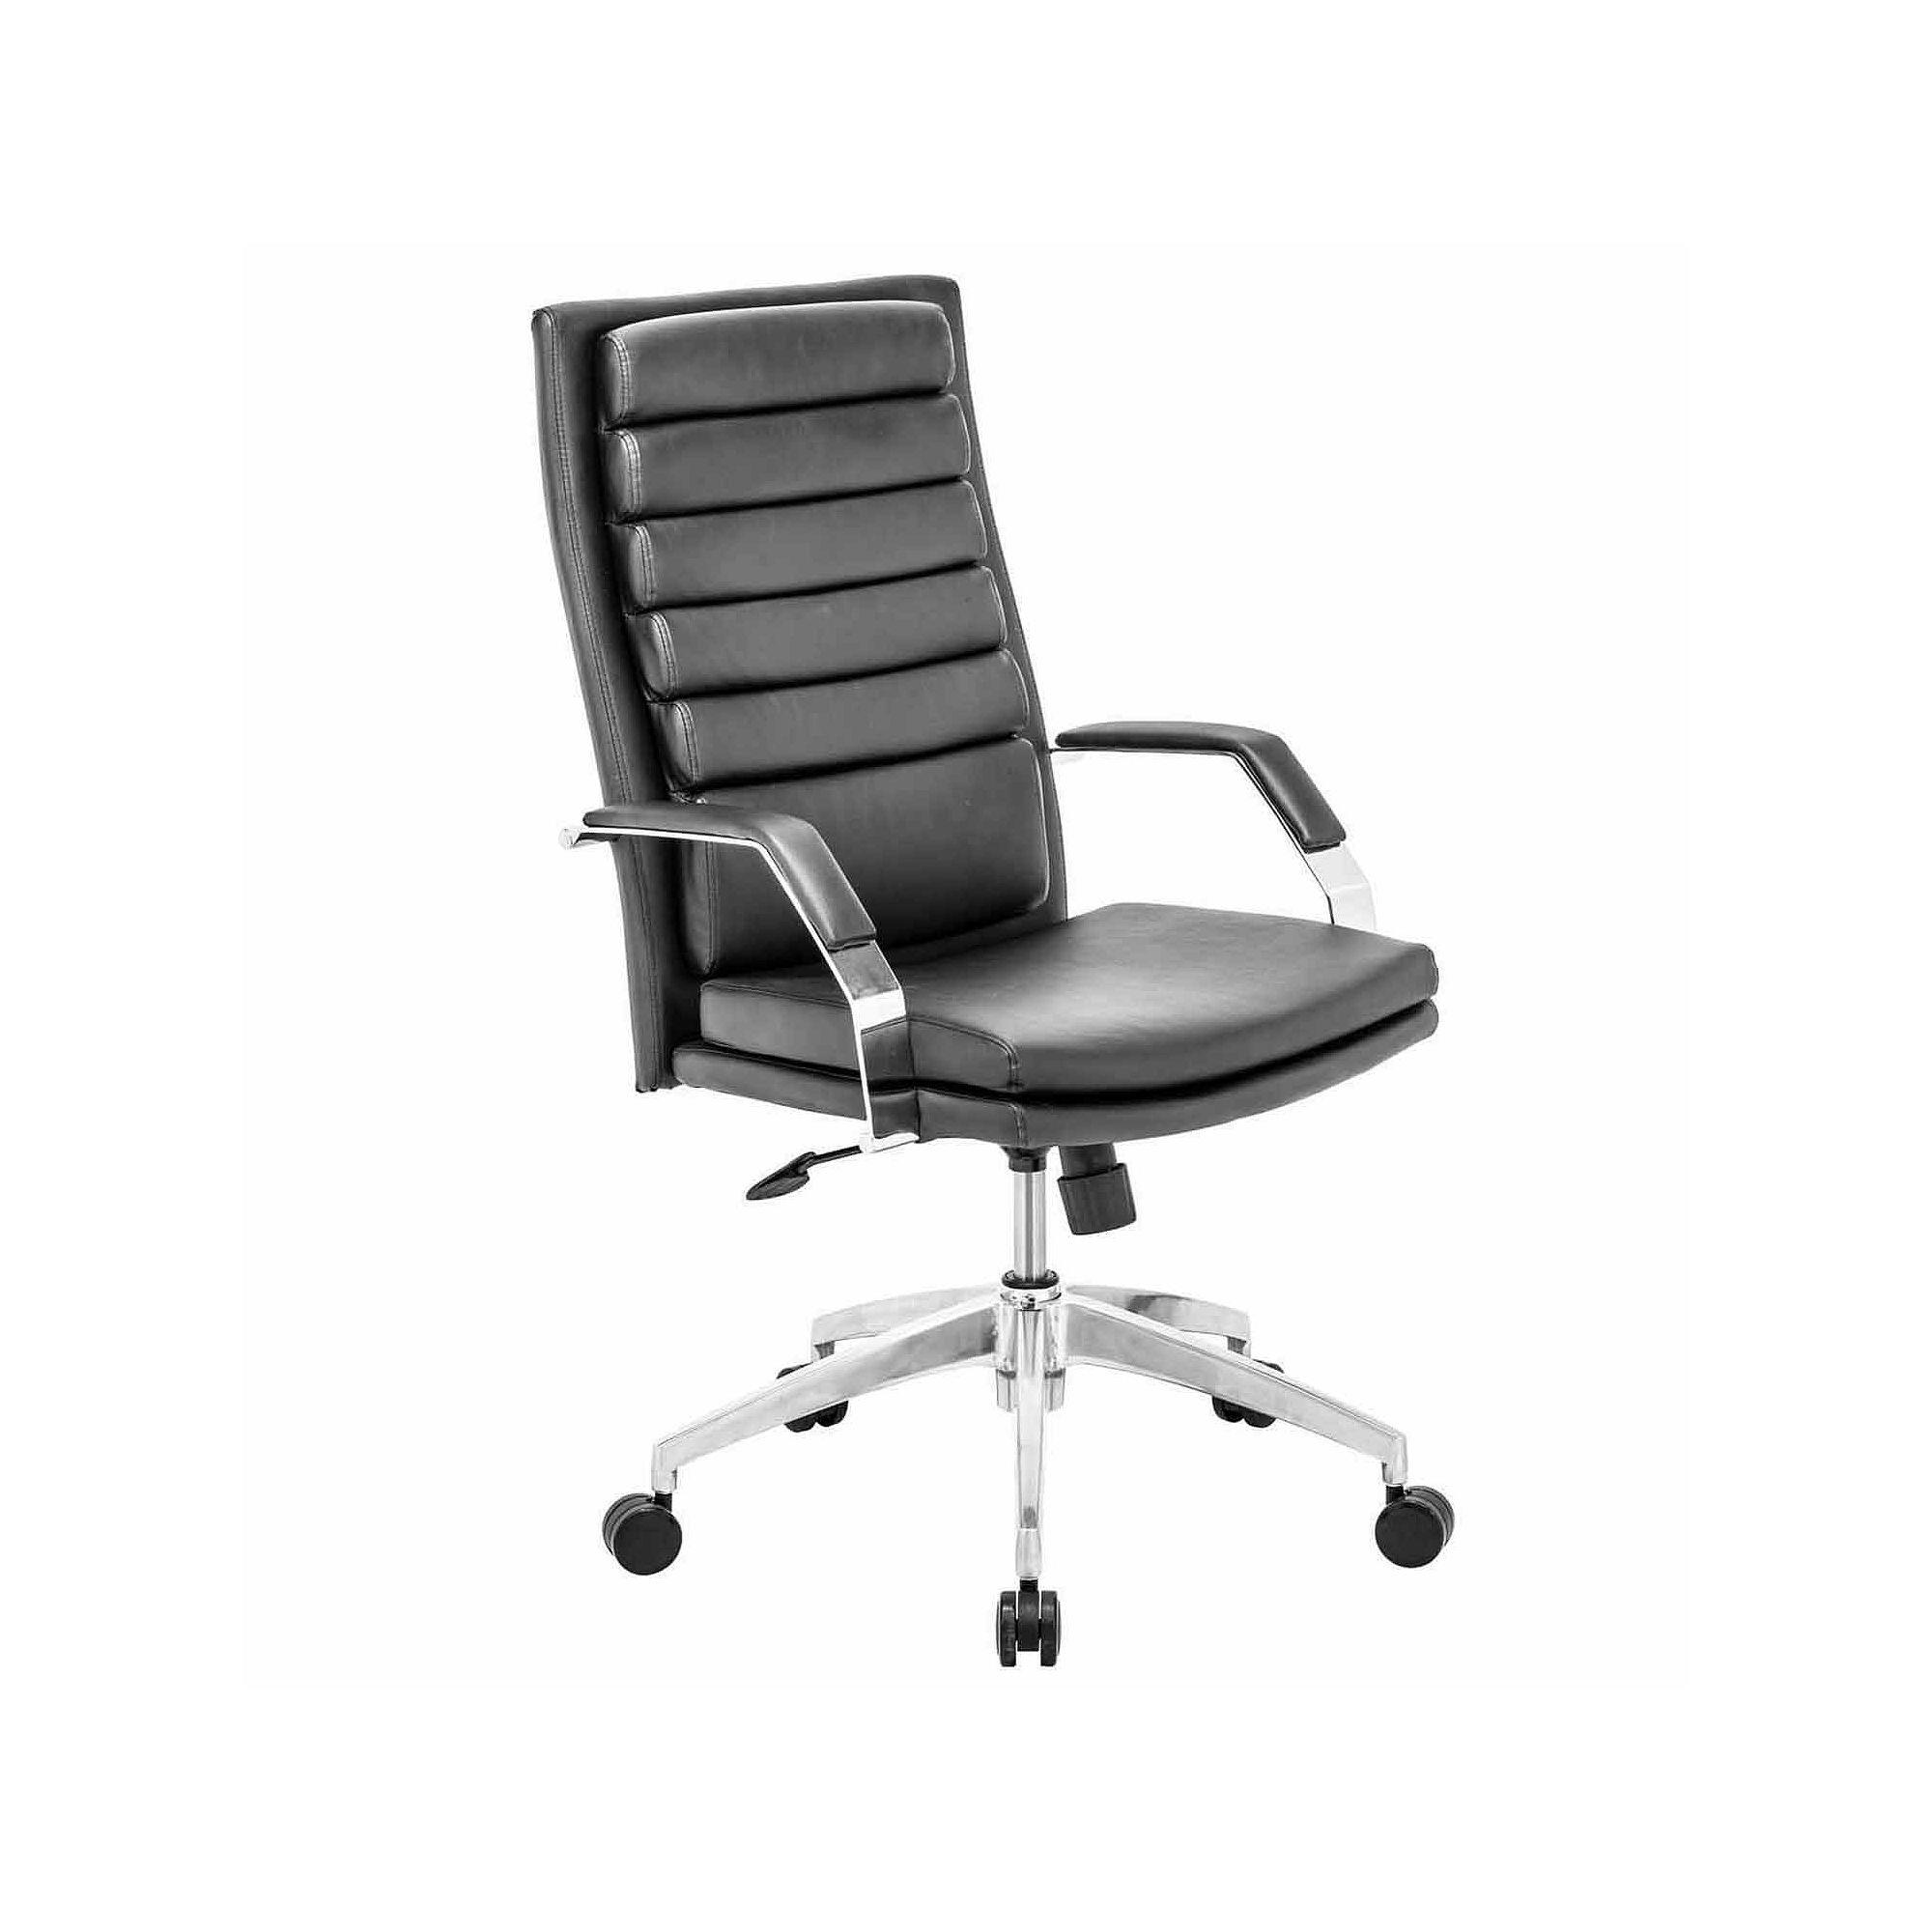 Director Comfort Office Chair